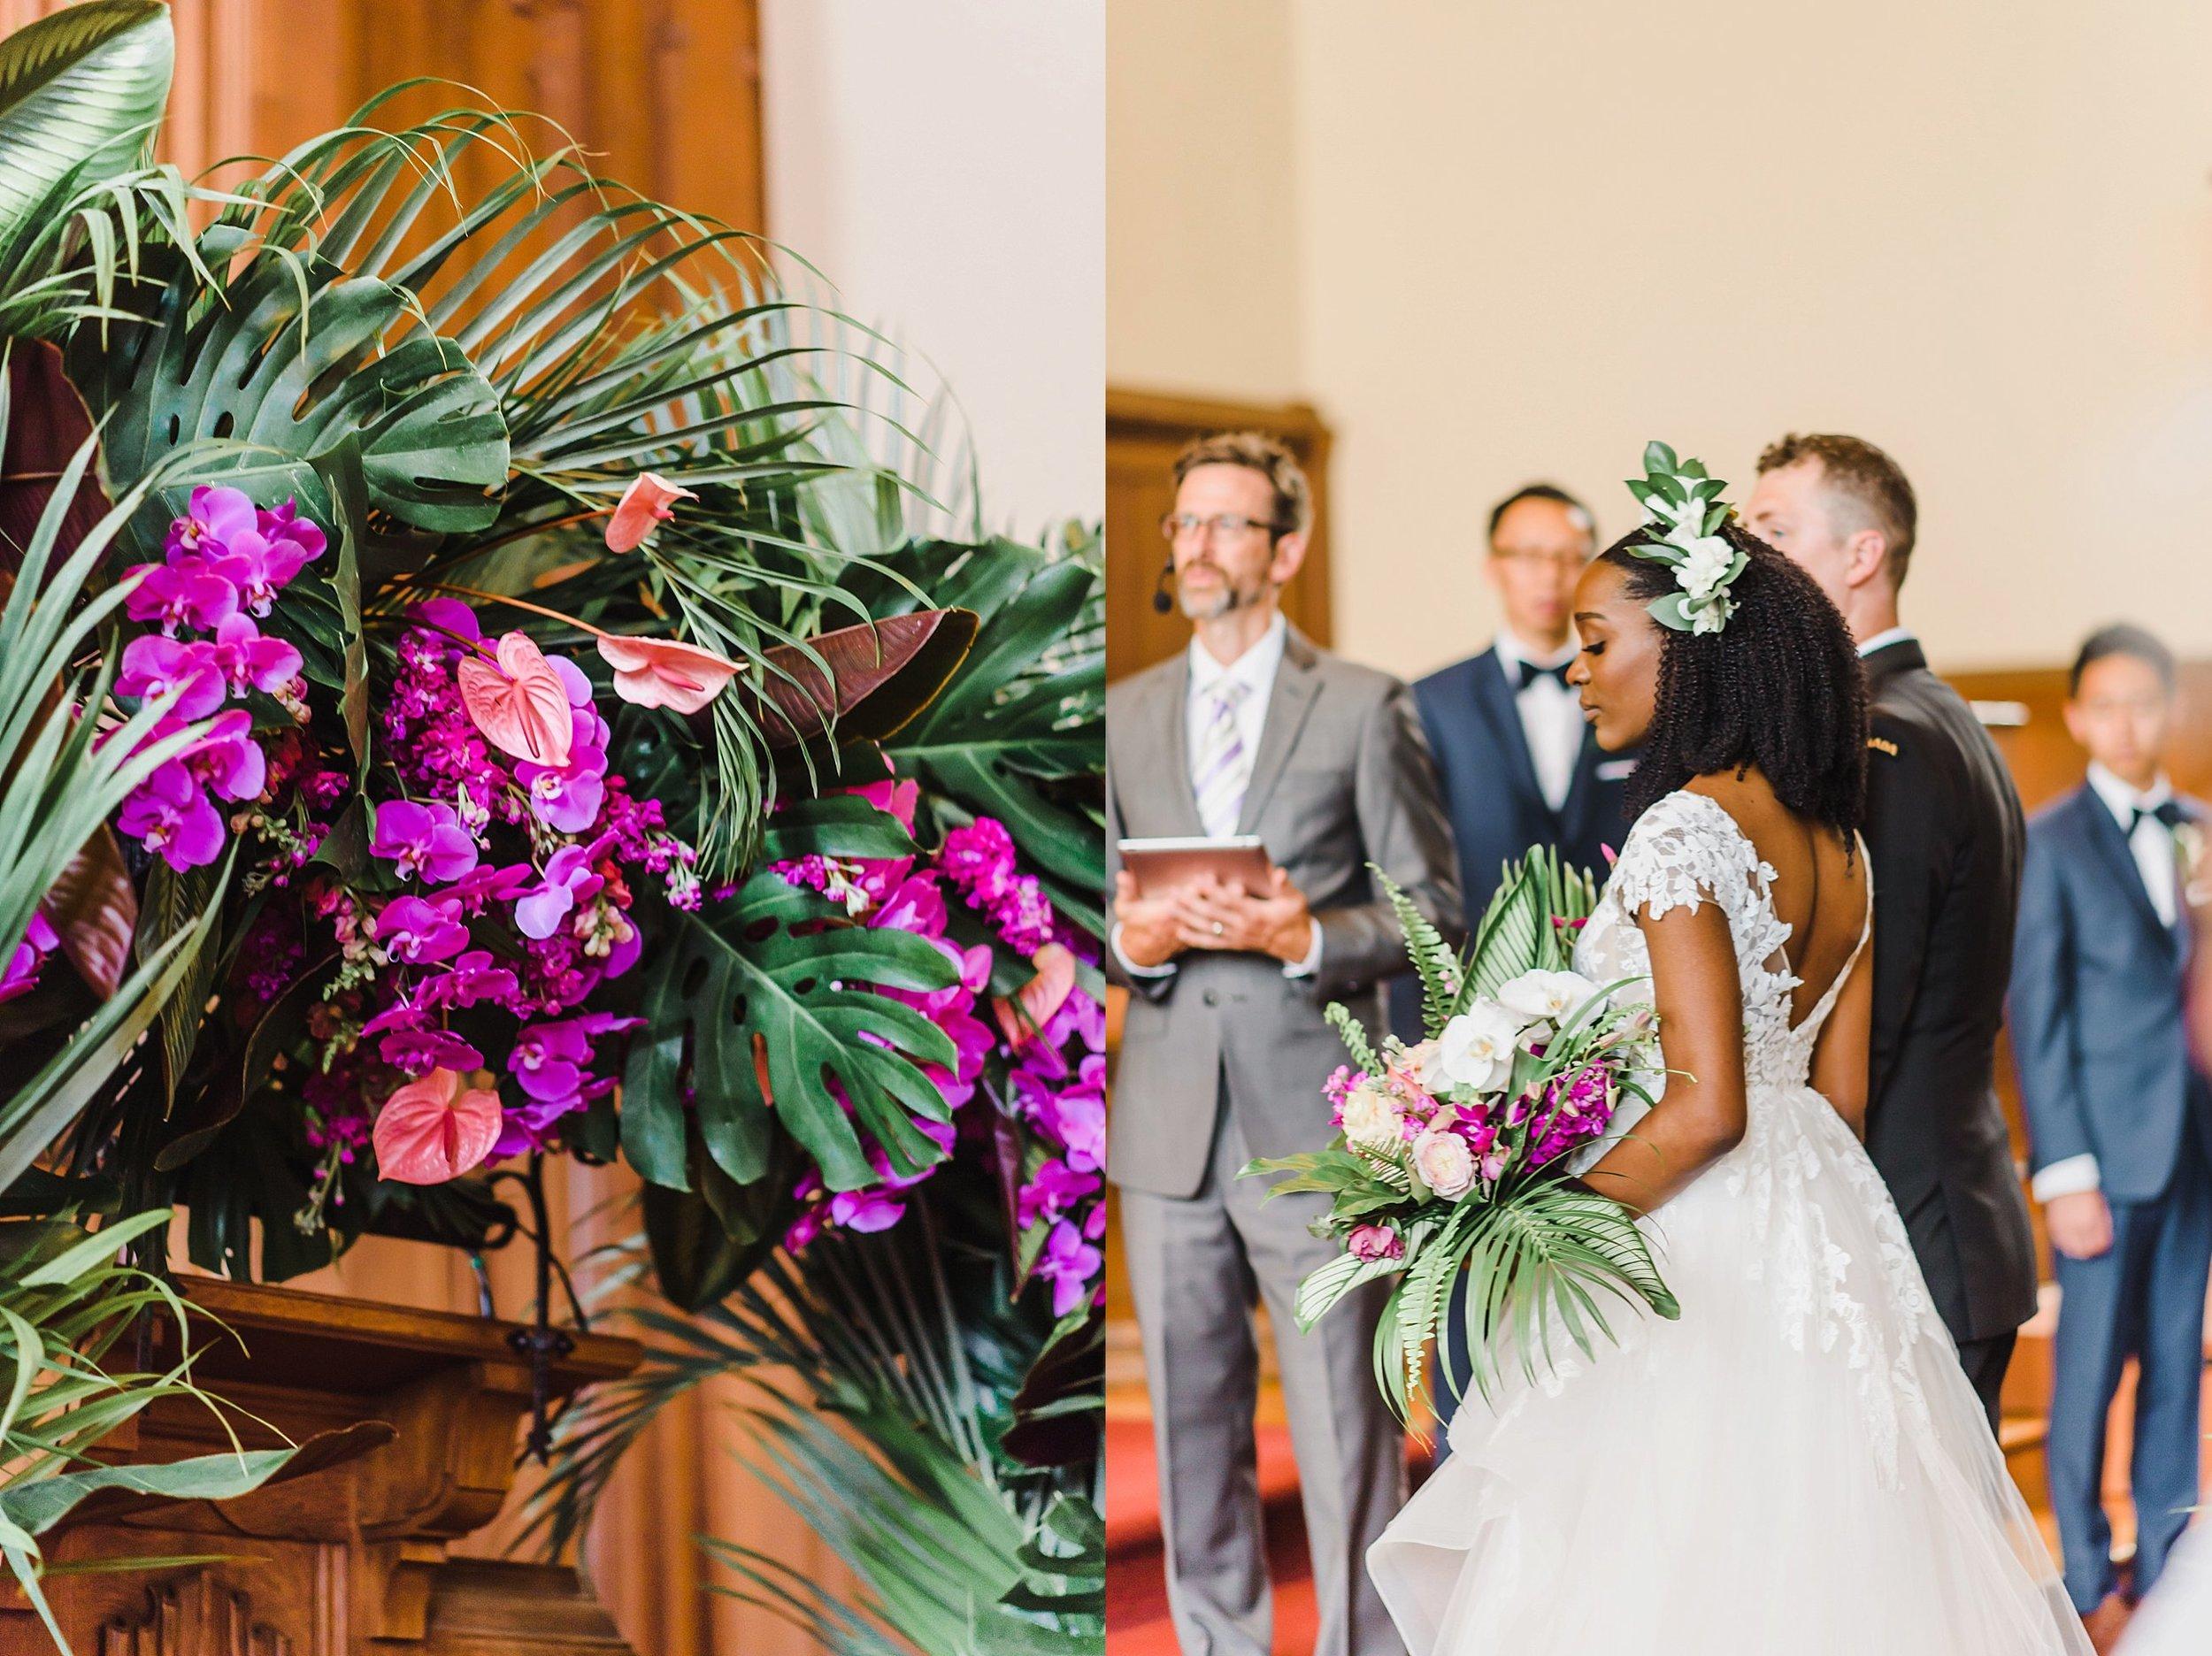 light airy indie fine art ottawa wedding photographer | Ali and Batoul Photography_0974.jpg